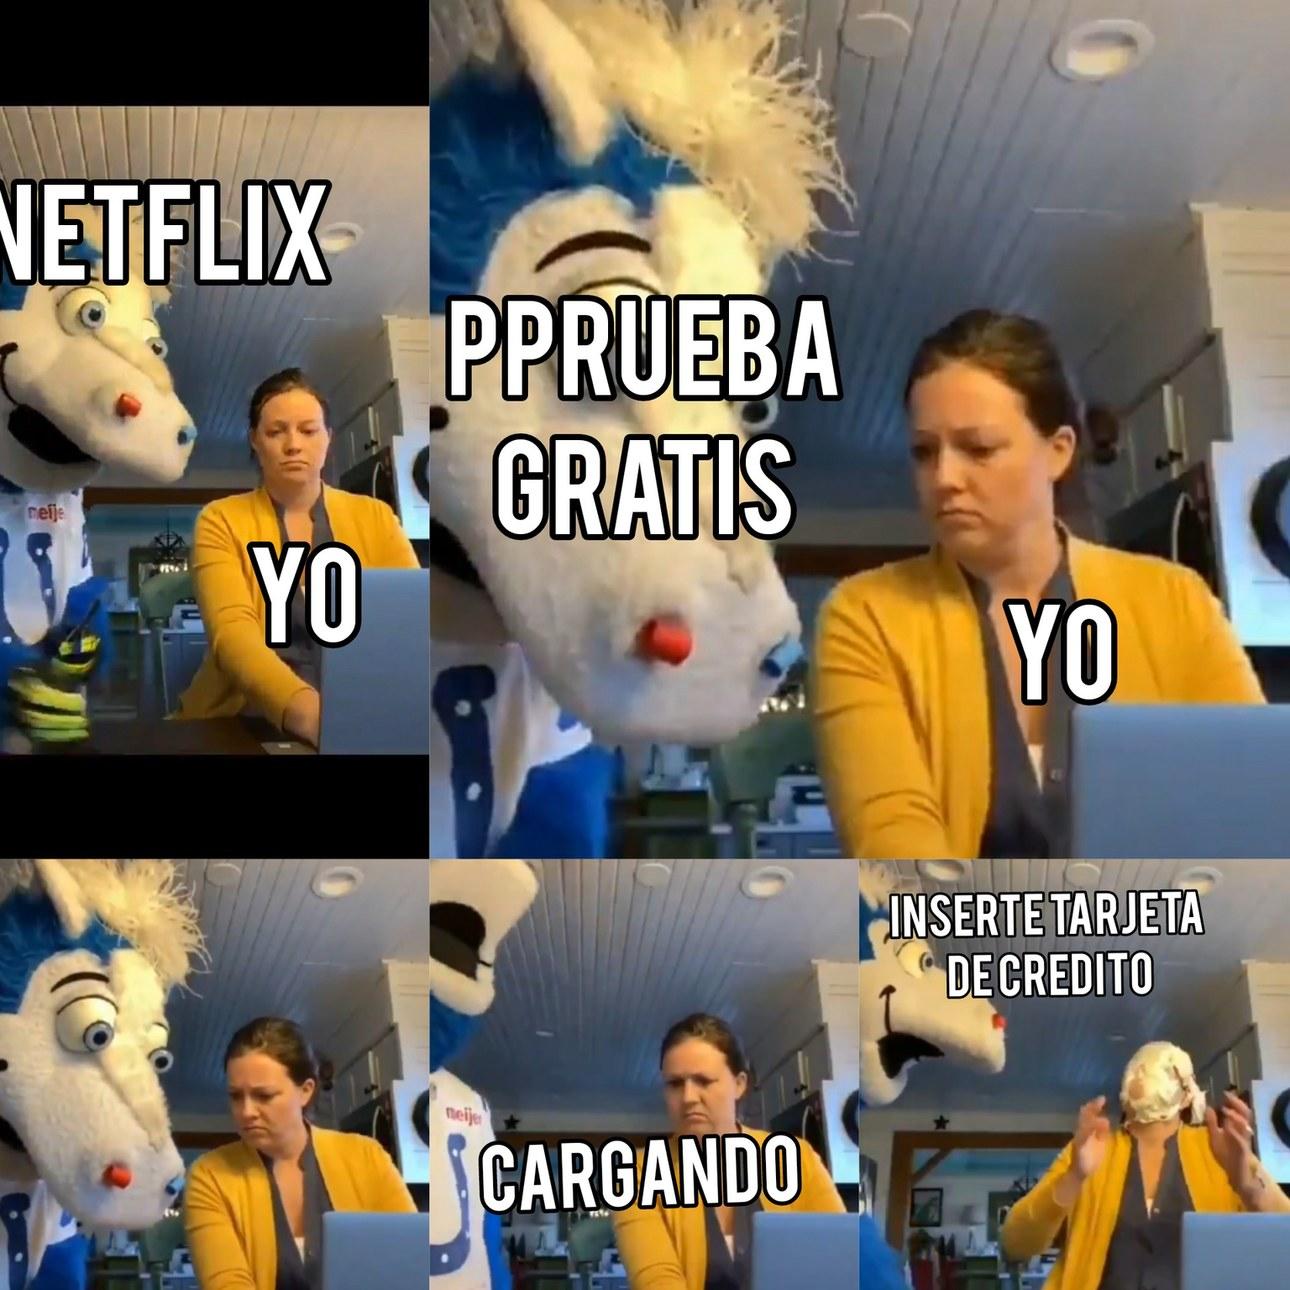 Netflix y sus mamadas acepten plx - meme